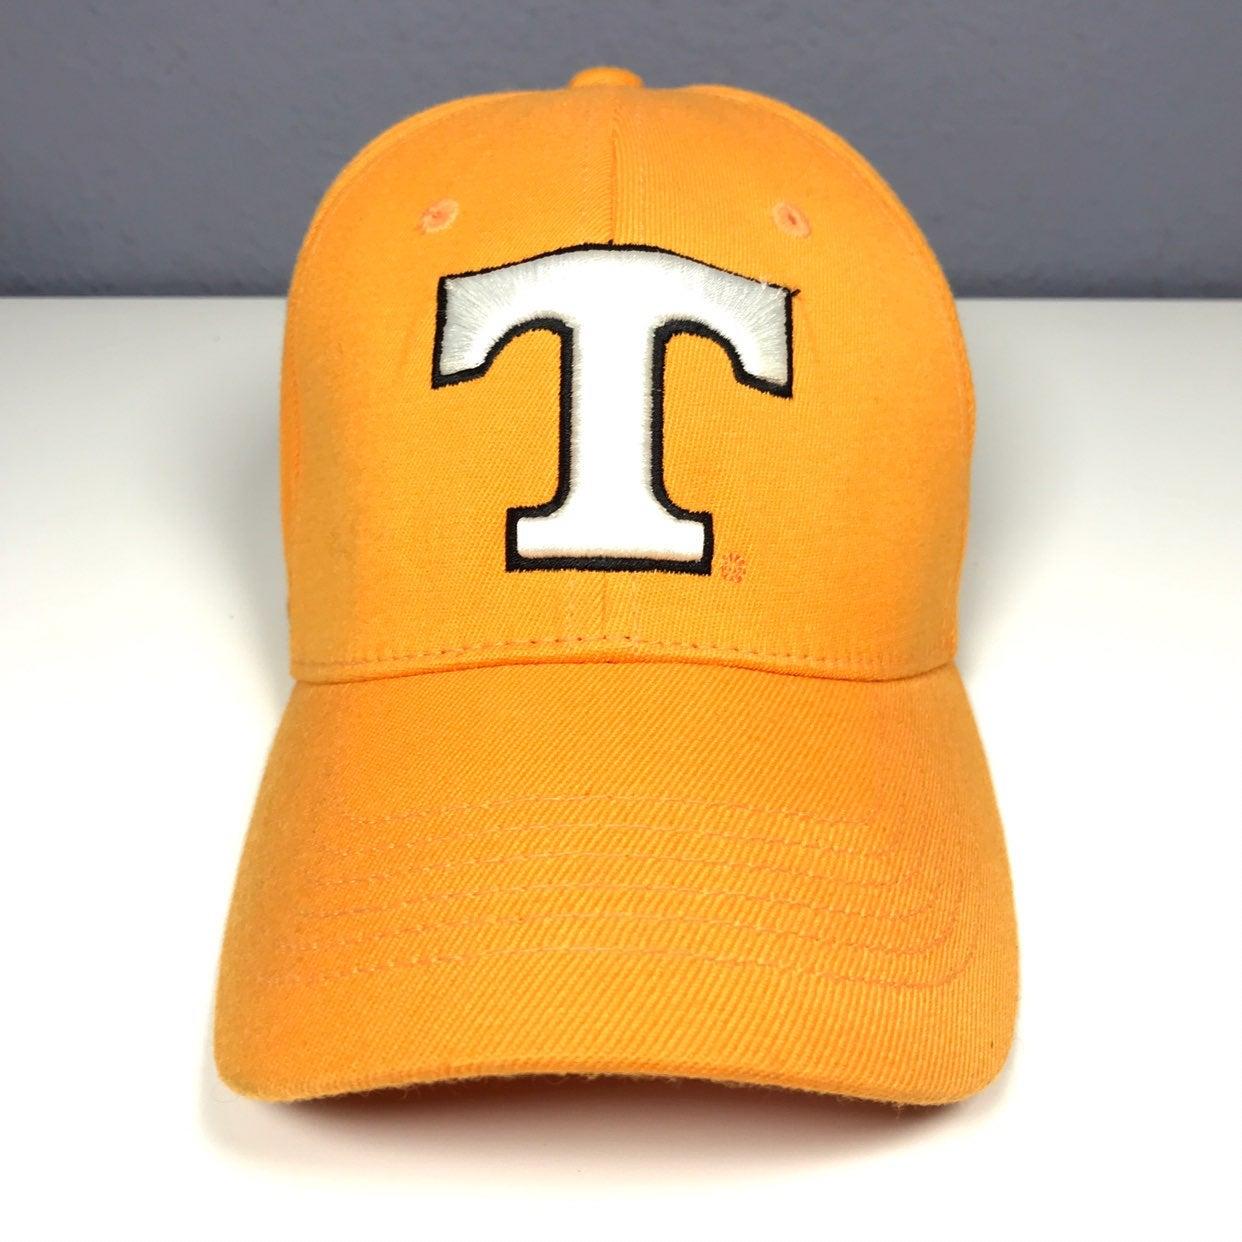 Tennessee vols hat Volunteers cap